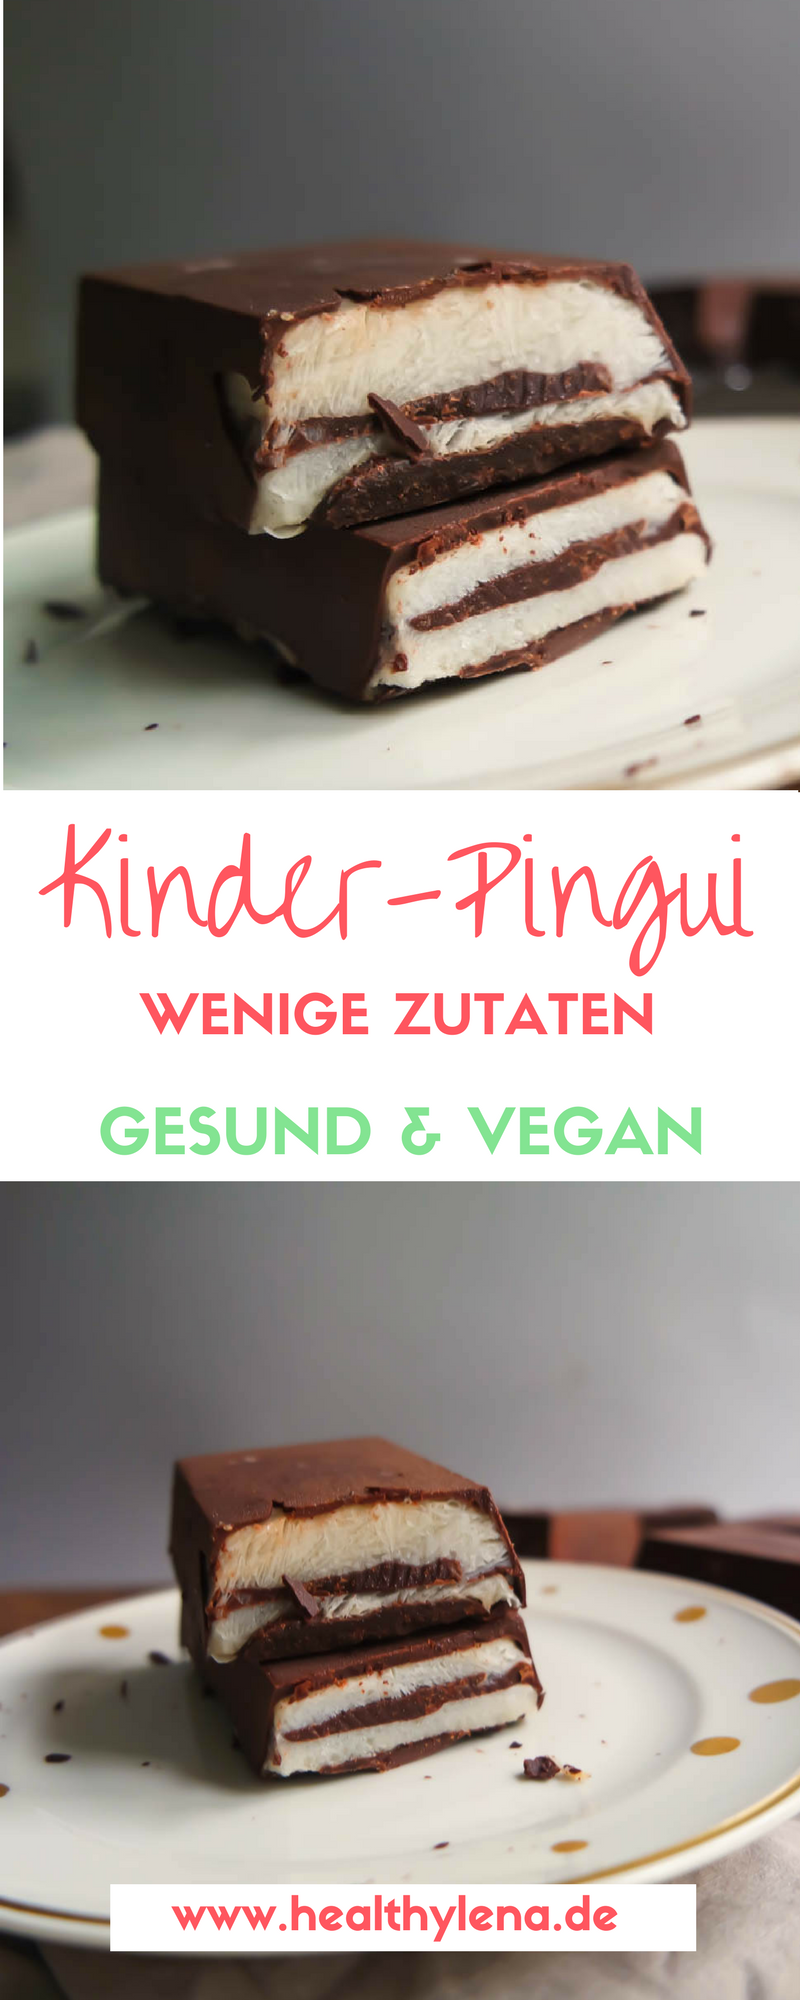 Vegane Kinder Pingui Selber Machen Rezept Mit Varianten Lecker Vegane Rezepte Leckere Vegane Rezepte